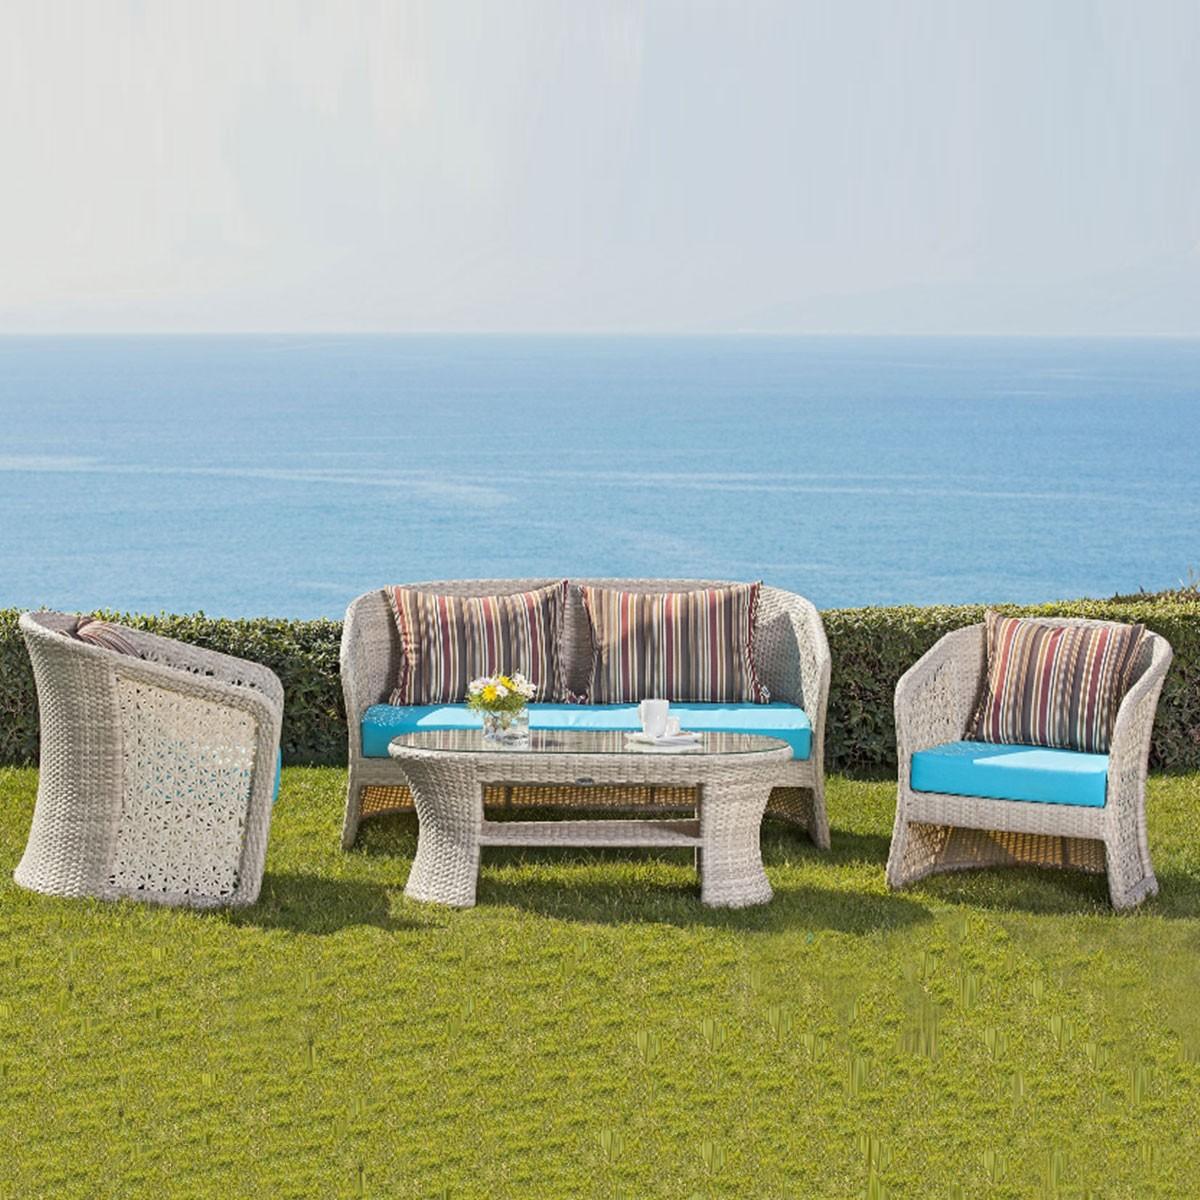 4-Piece PE Rattan Sofa Set: 1 * Loveseat, 2 * Lounge Chair, 1 * Coffee Table (LLS-FSAL01)